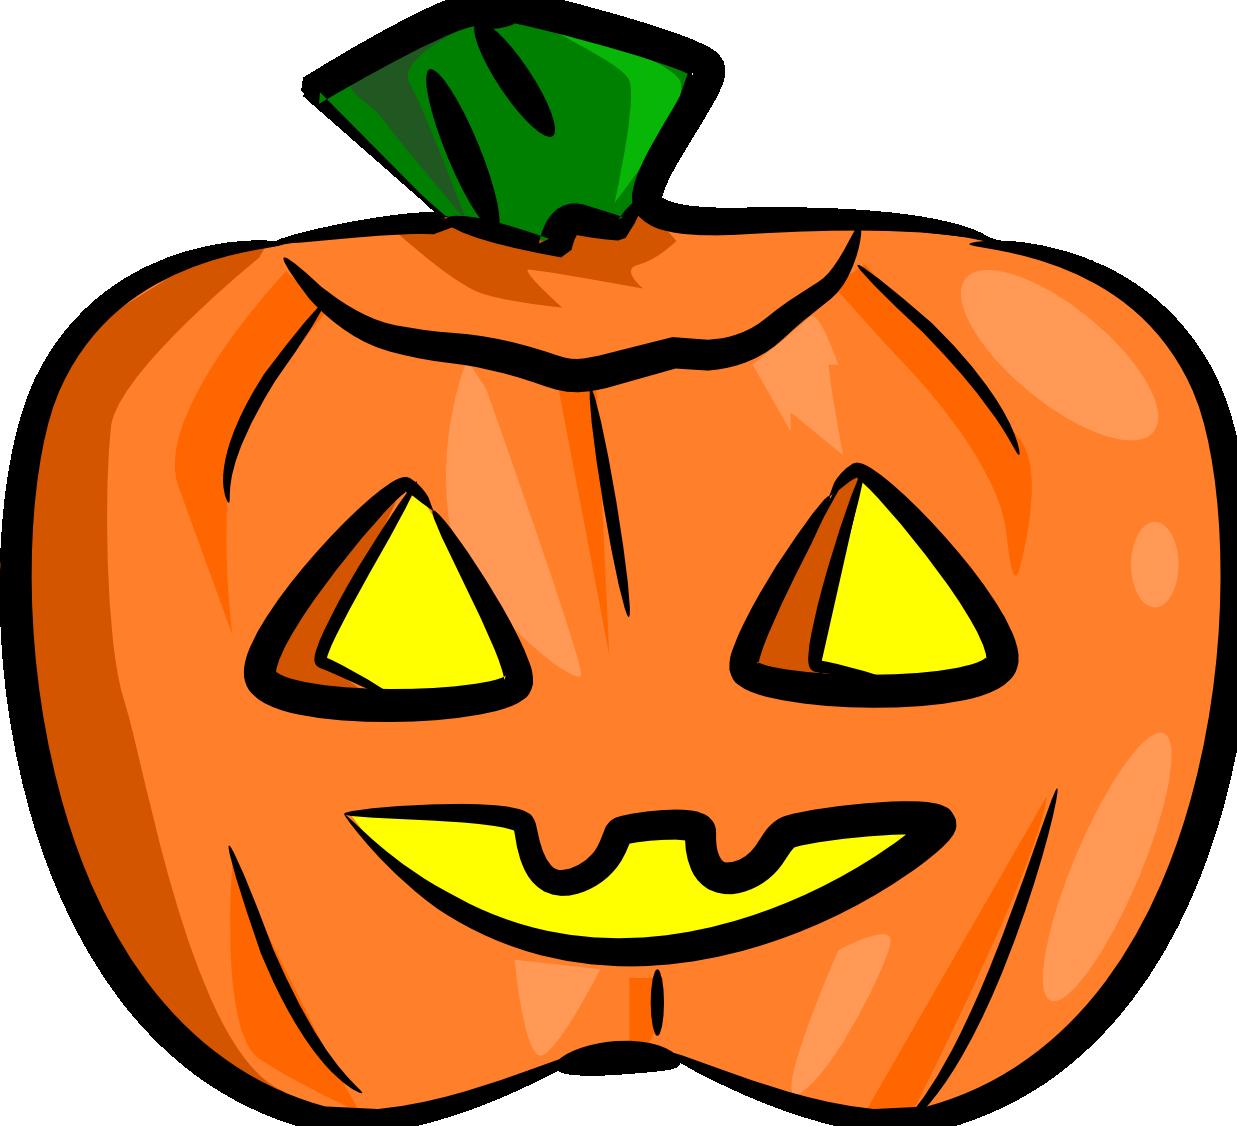 Friendly jack o lantern clipart clipart suggest for Halloween pumpkin clipart